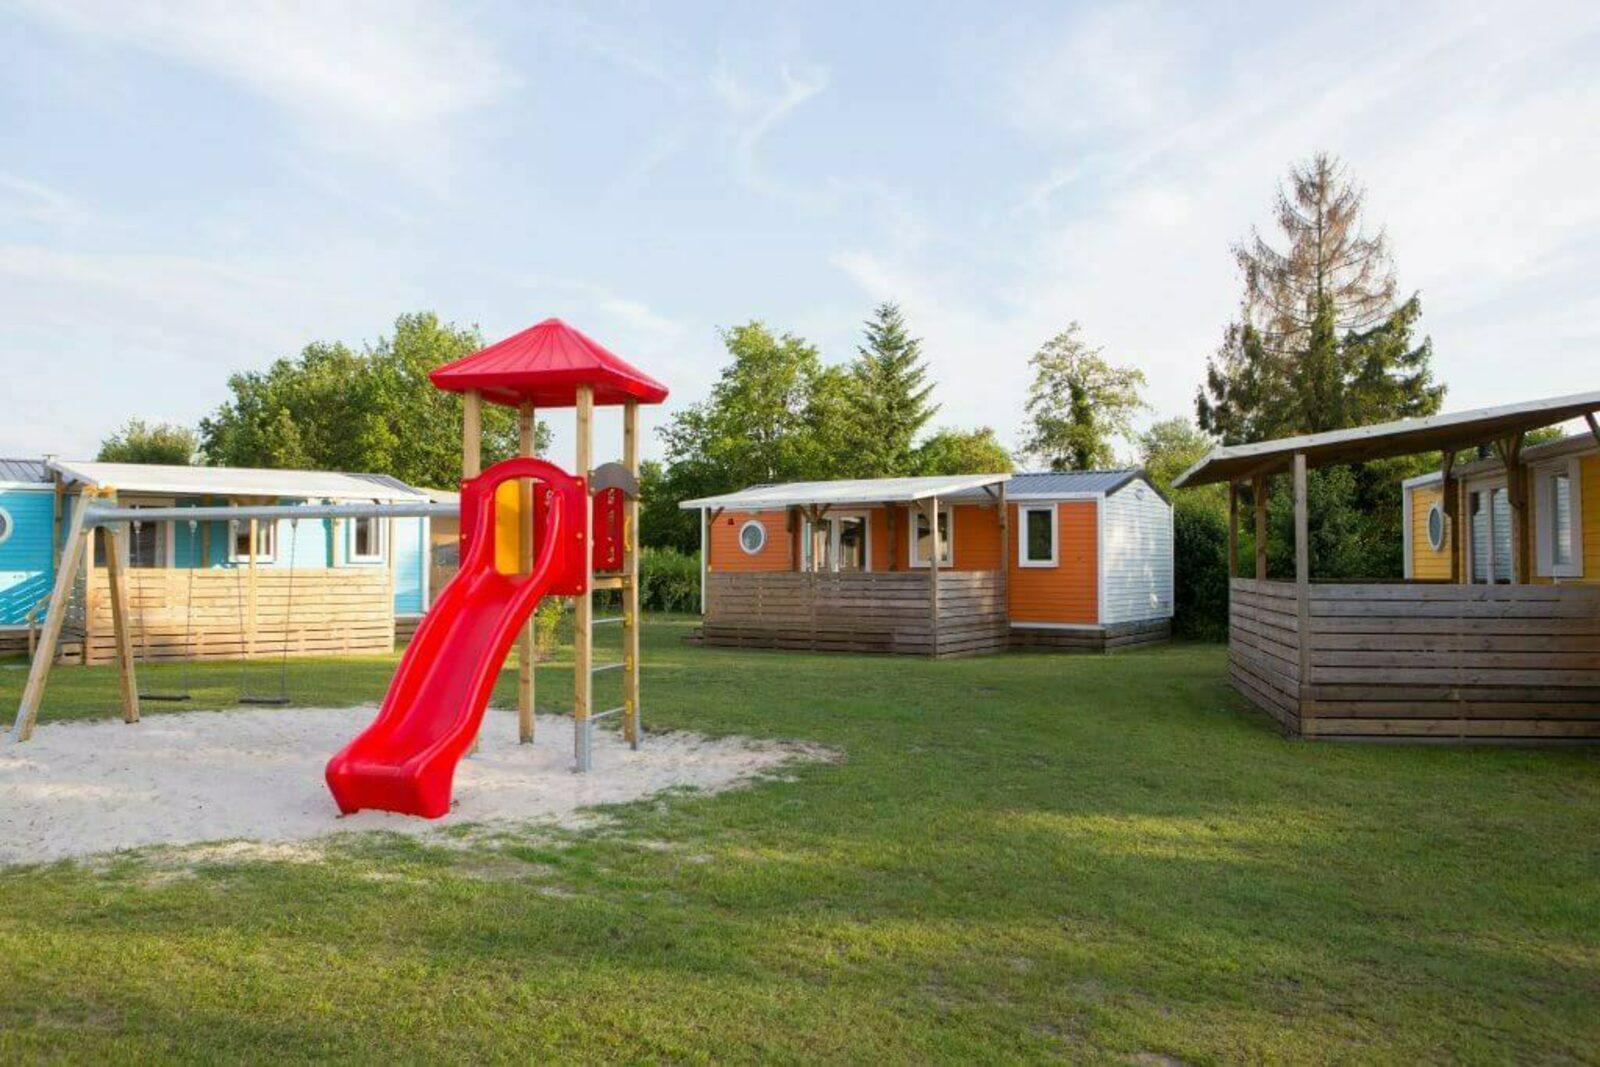 Verandalodge - Camping 't Veld